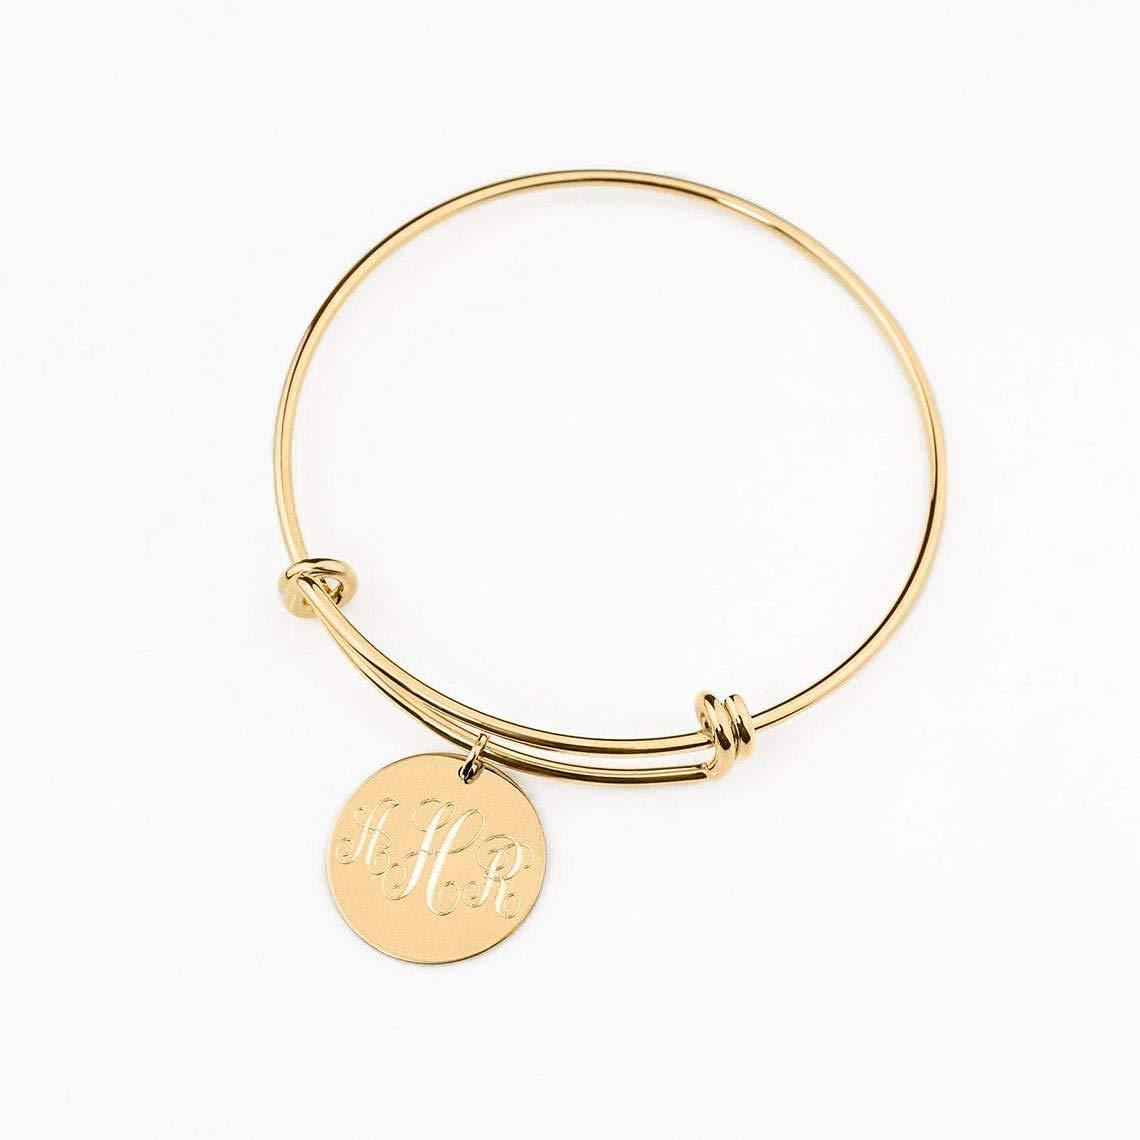 Gold initial bracelet bridesmaid gift bridesmaid bracelet letter bangle disc bracelet letter bracelet personalized gold Initial bangle